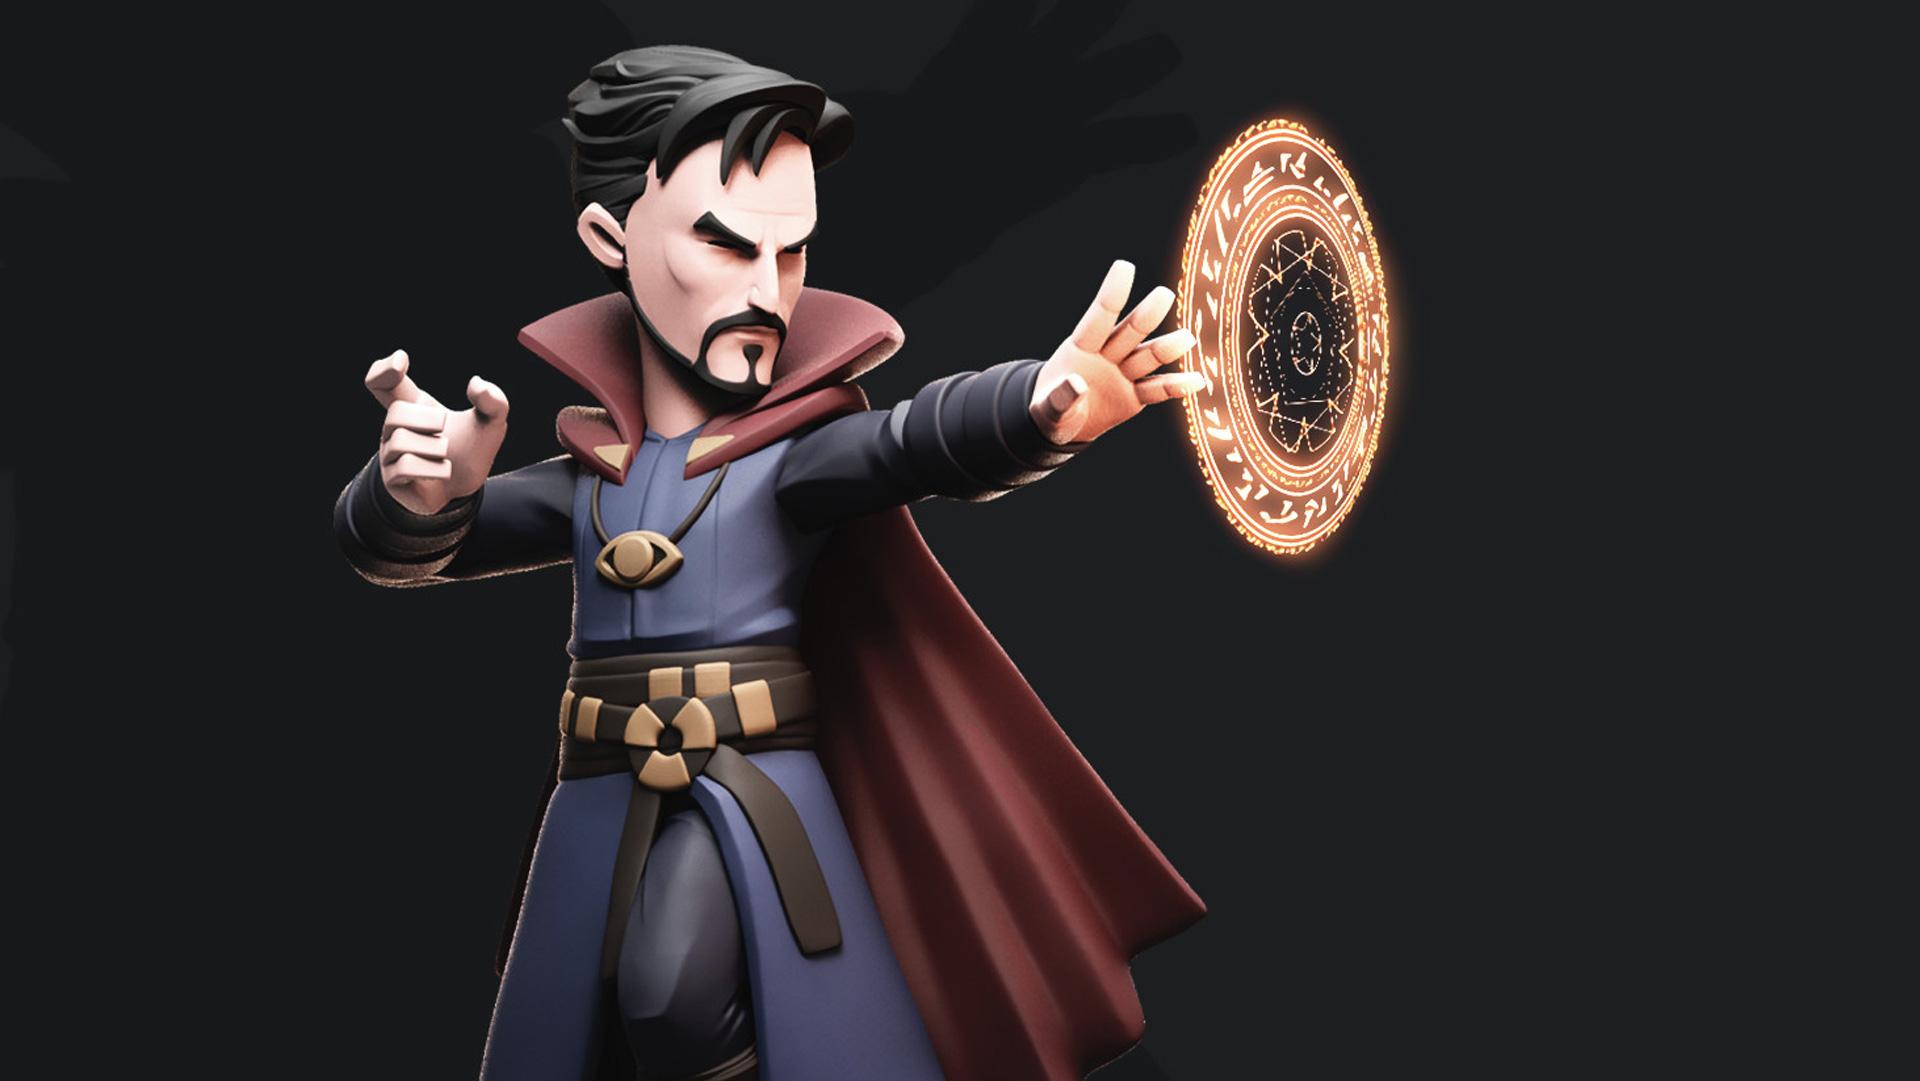 Gravity Falls Wallpaper Android Doctor Strange 3d Avengers Infinity War Hd Superheroes